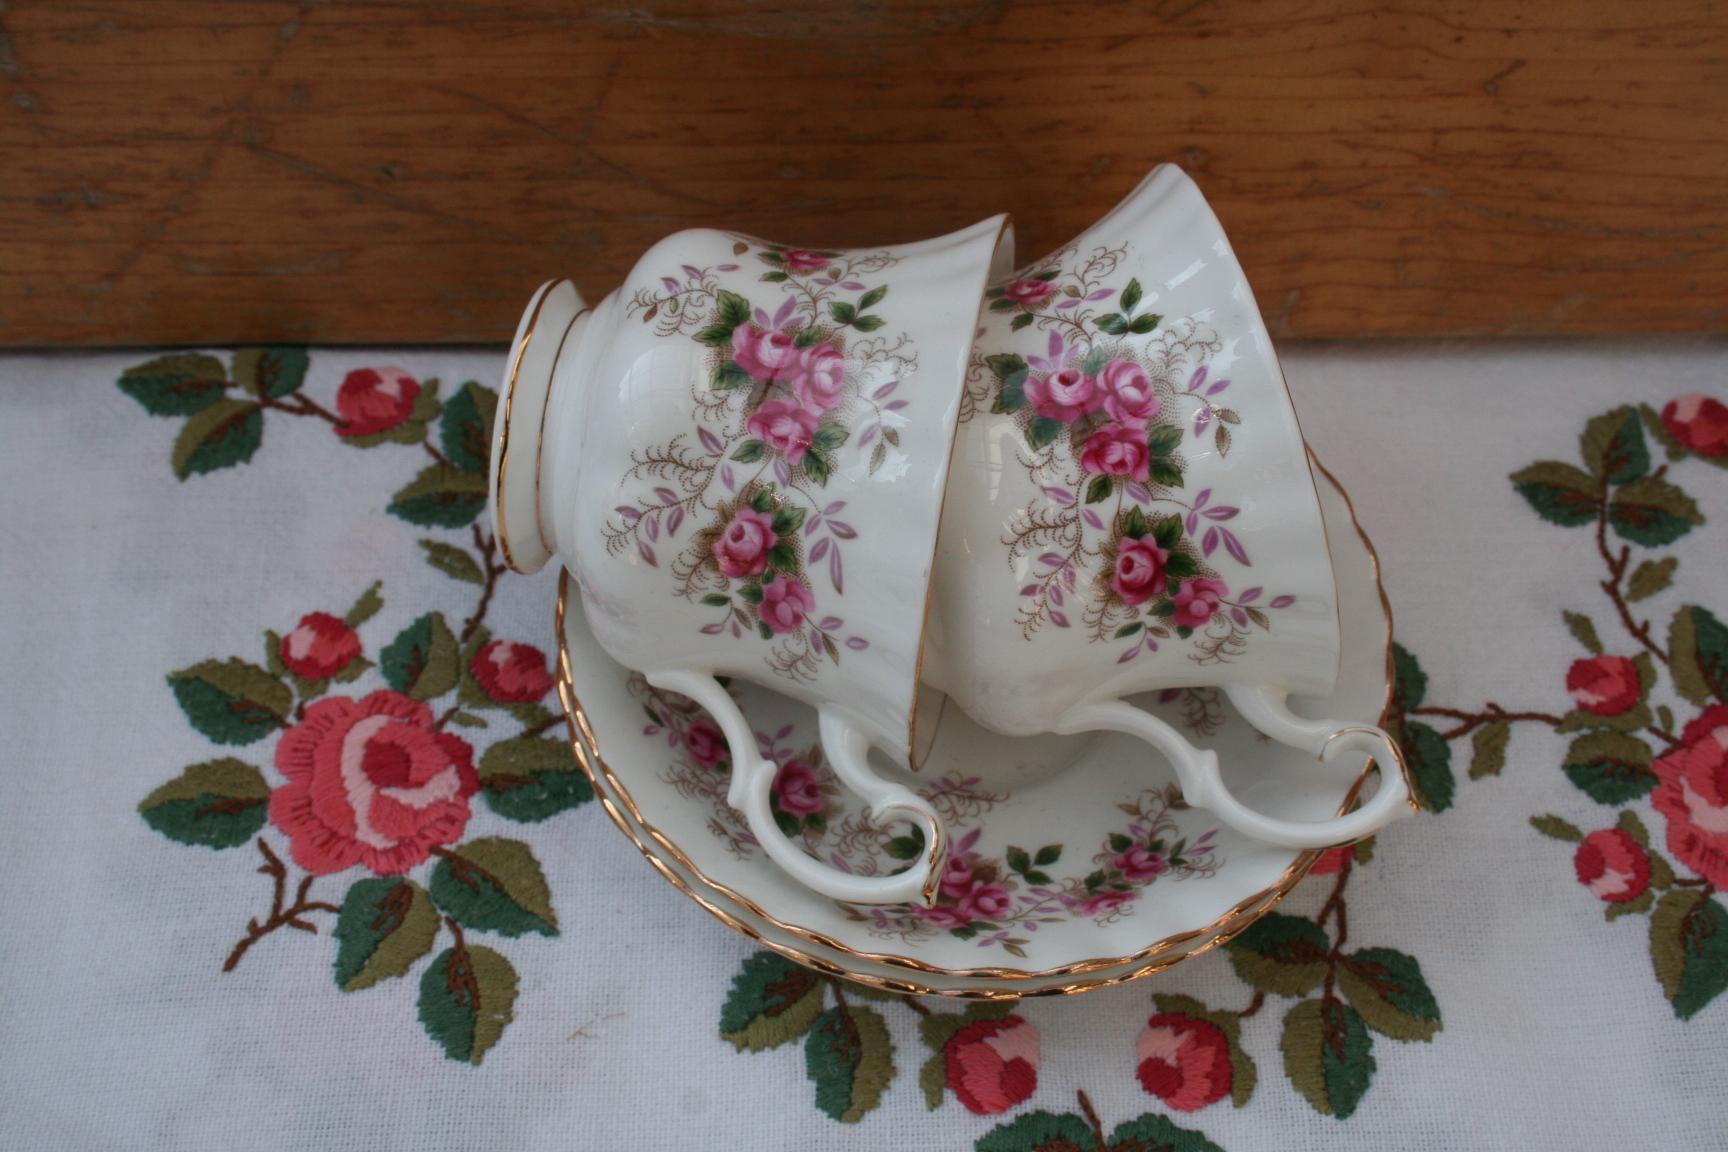 Royal Albert Servies Lavender Rose.Herenkopje Royal Albert Decor Lavender Rose Het Derde Servies